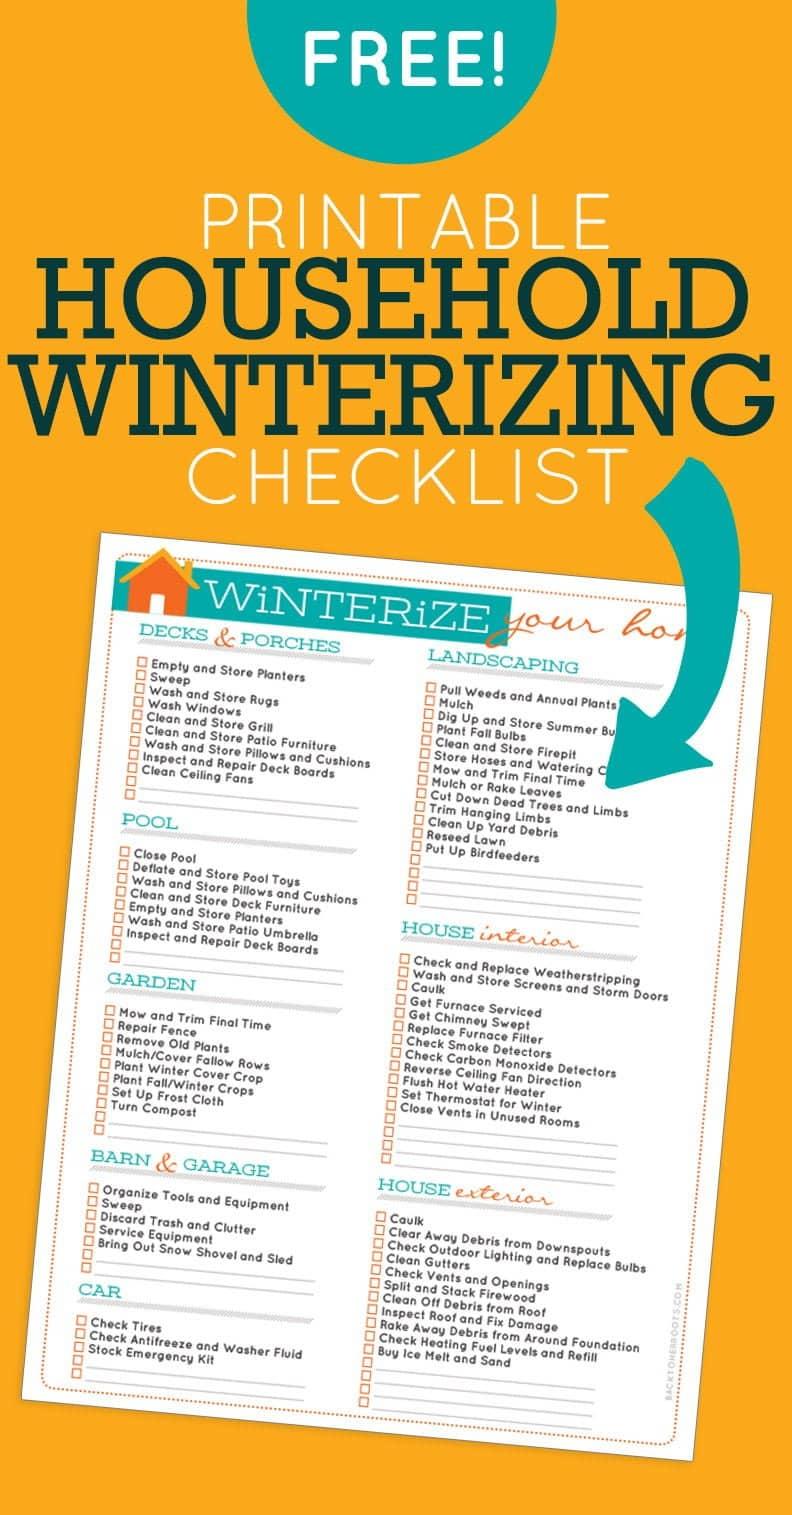 Free Printable Winterizing Checklist